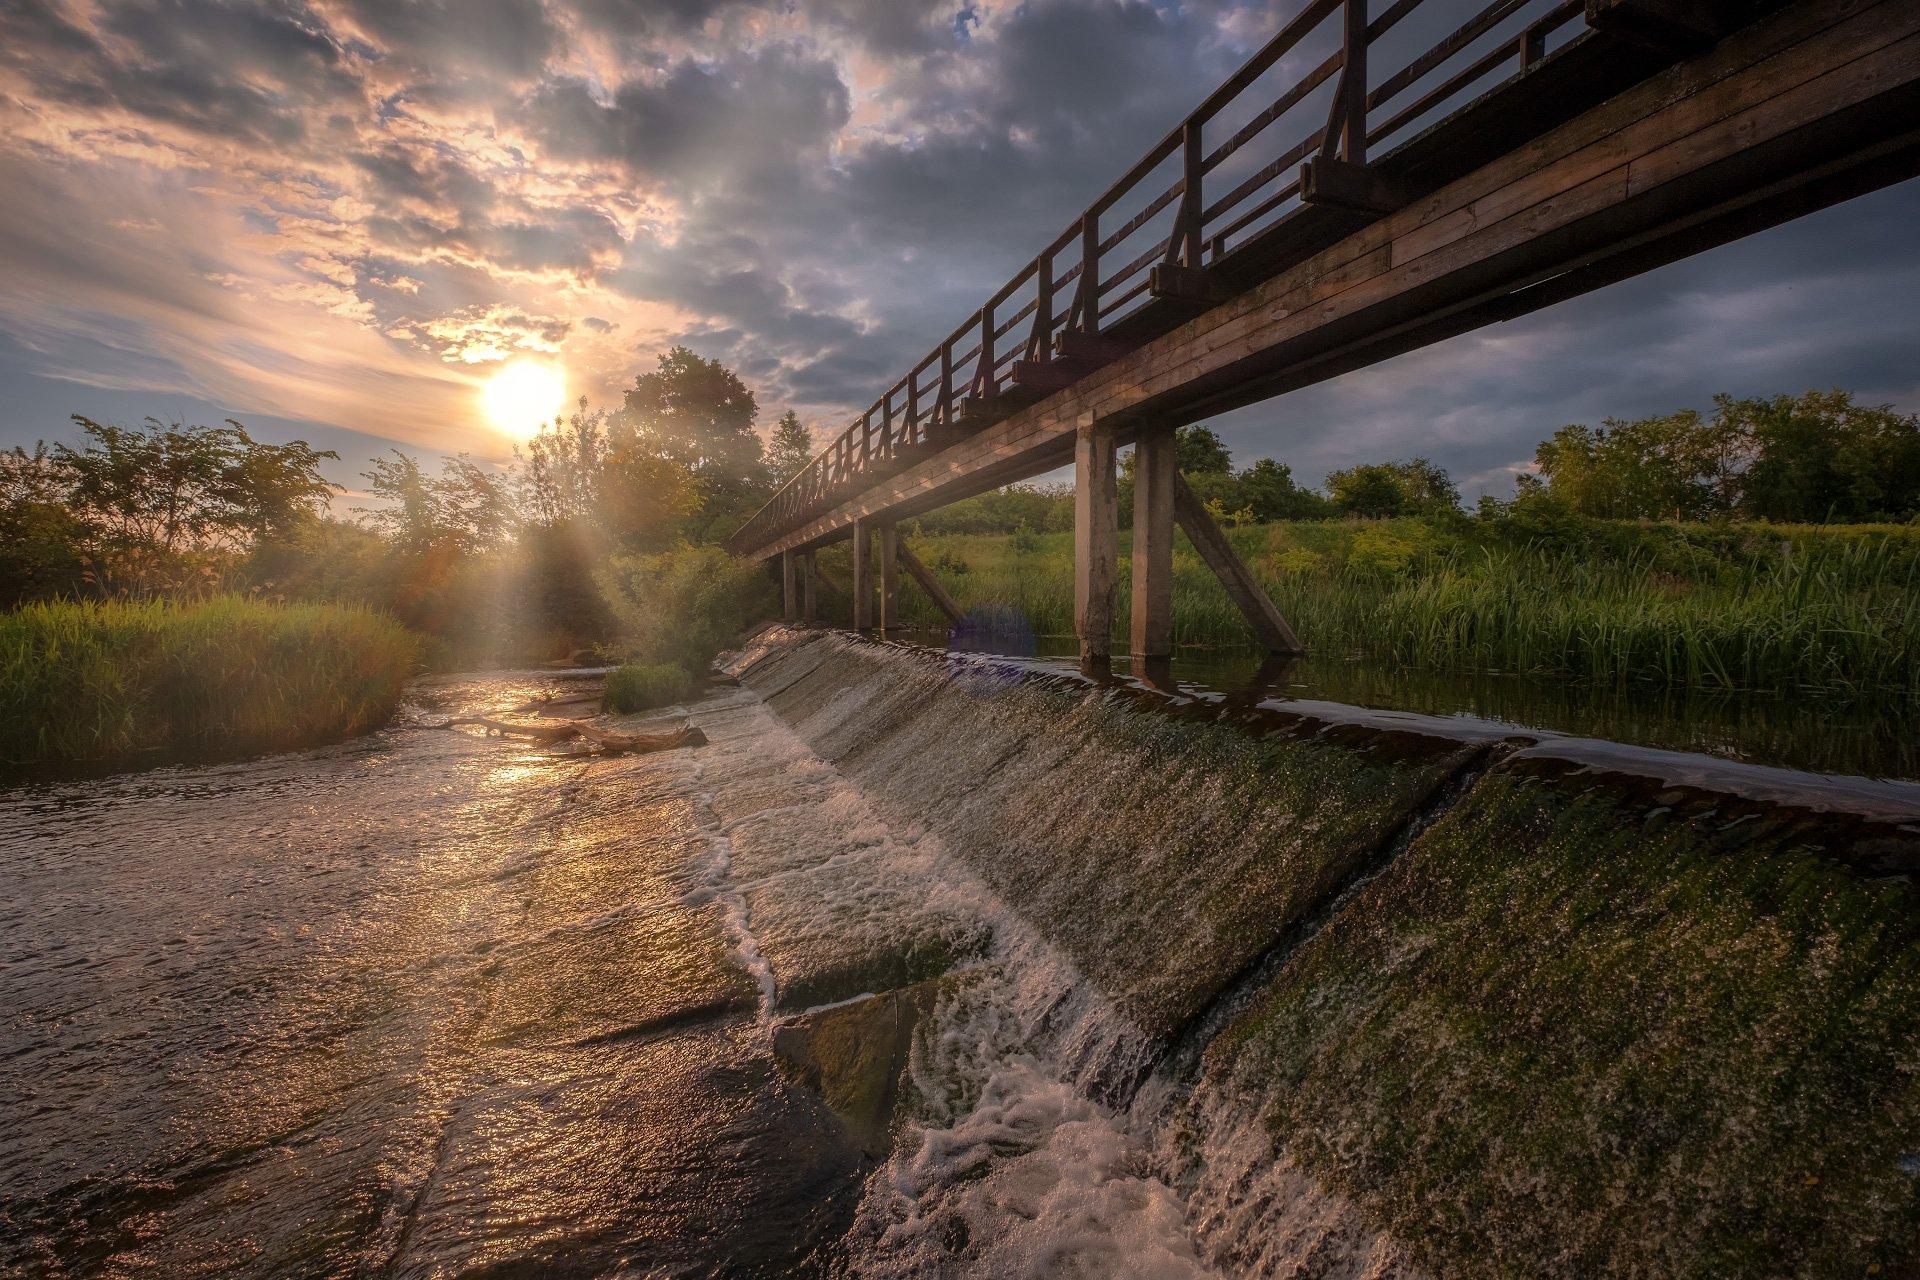 пейзаж, природа, река, каменка, порог, суздаль, утро, мост, Андрей Чиж